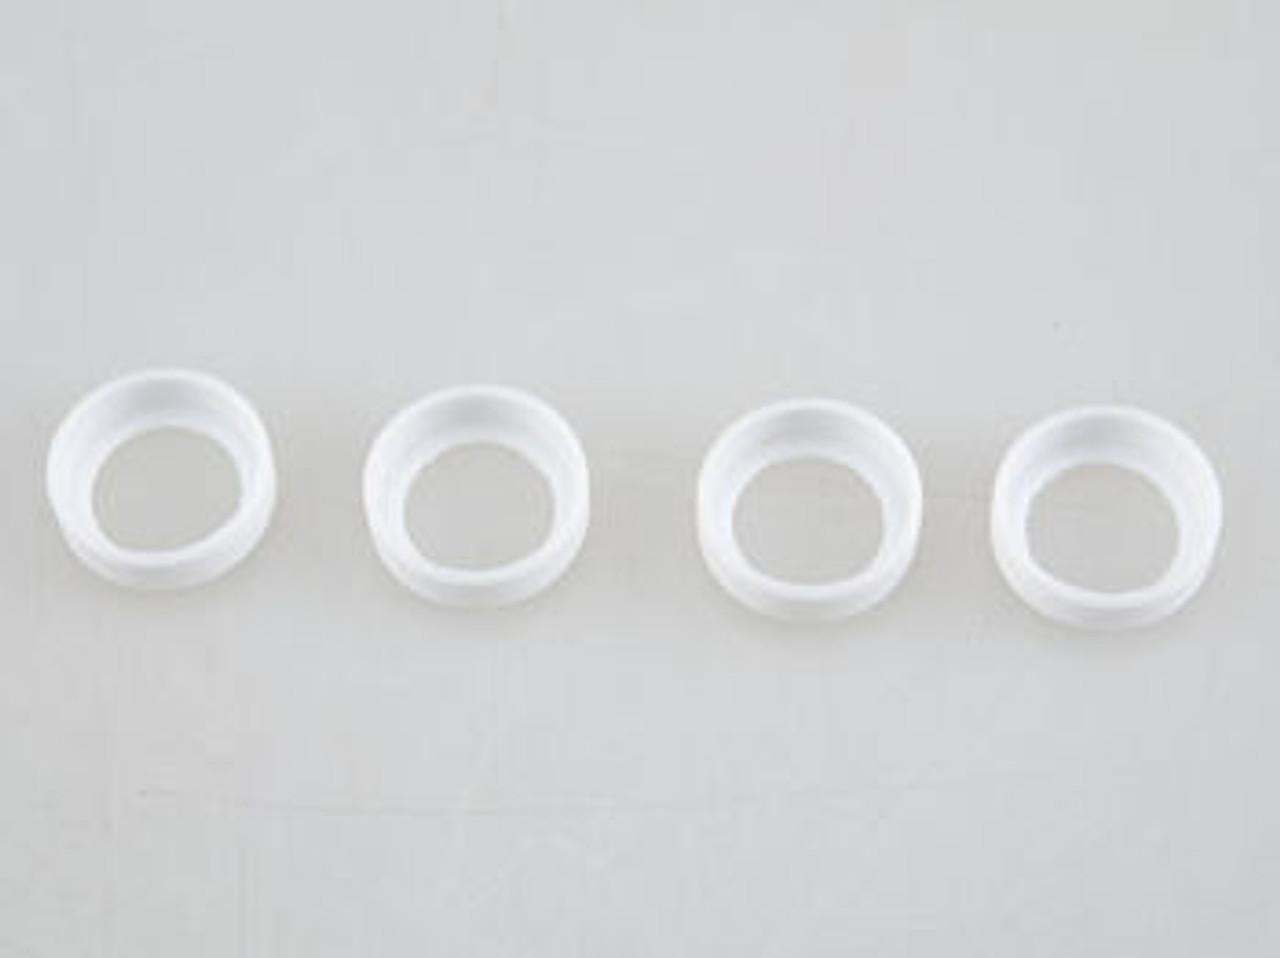 JQRacing Plastic Bearing Insert 4pcs (BE, WE) (JQB0383)